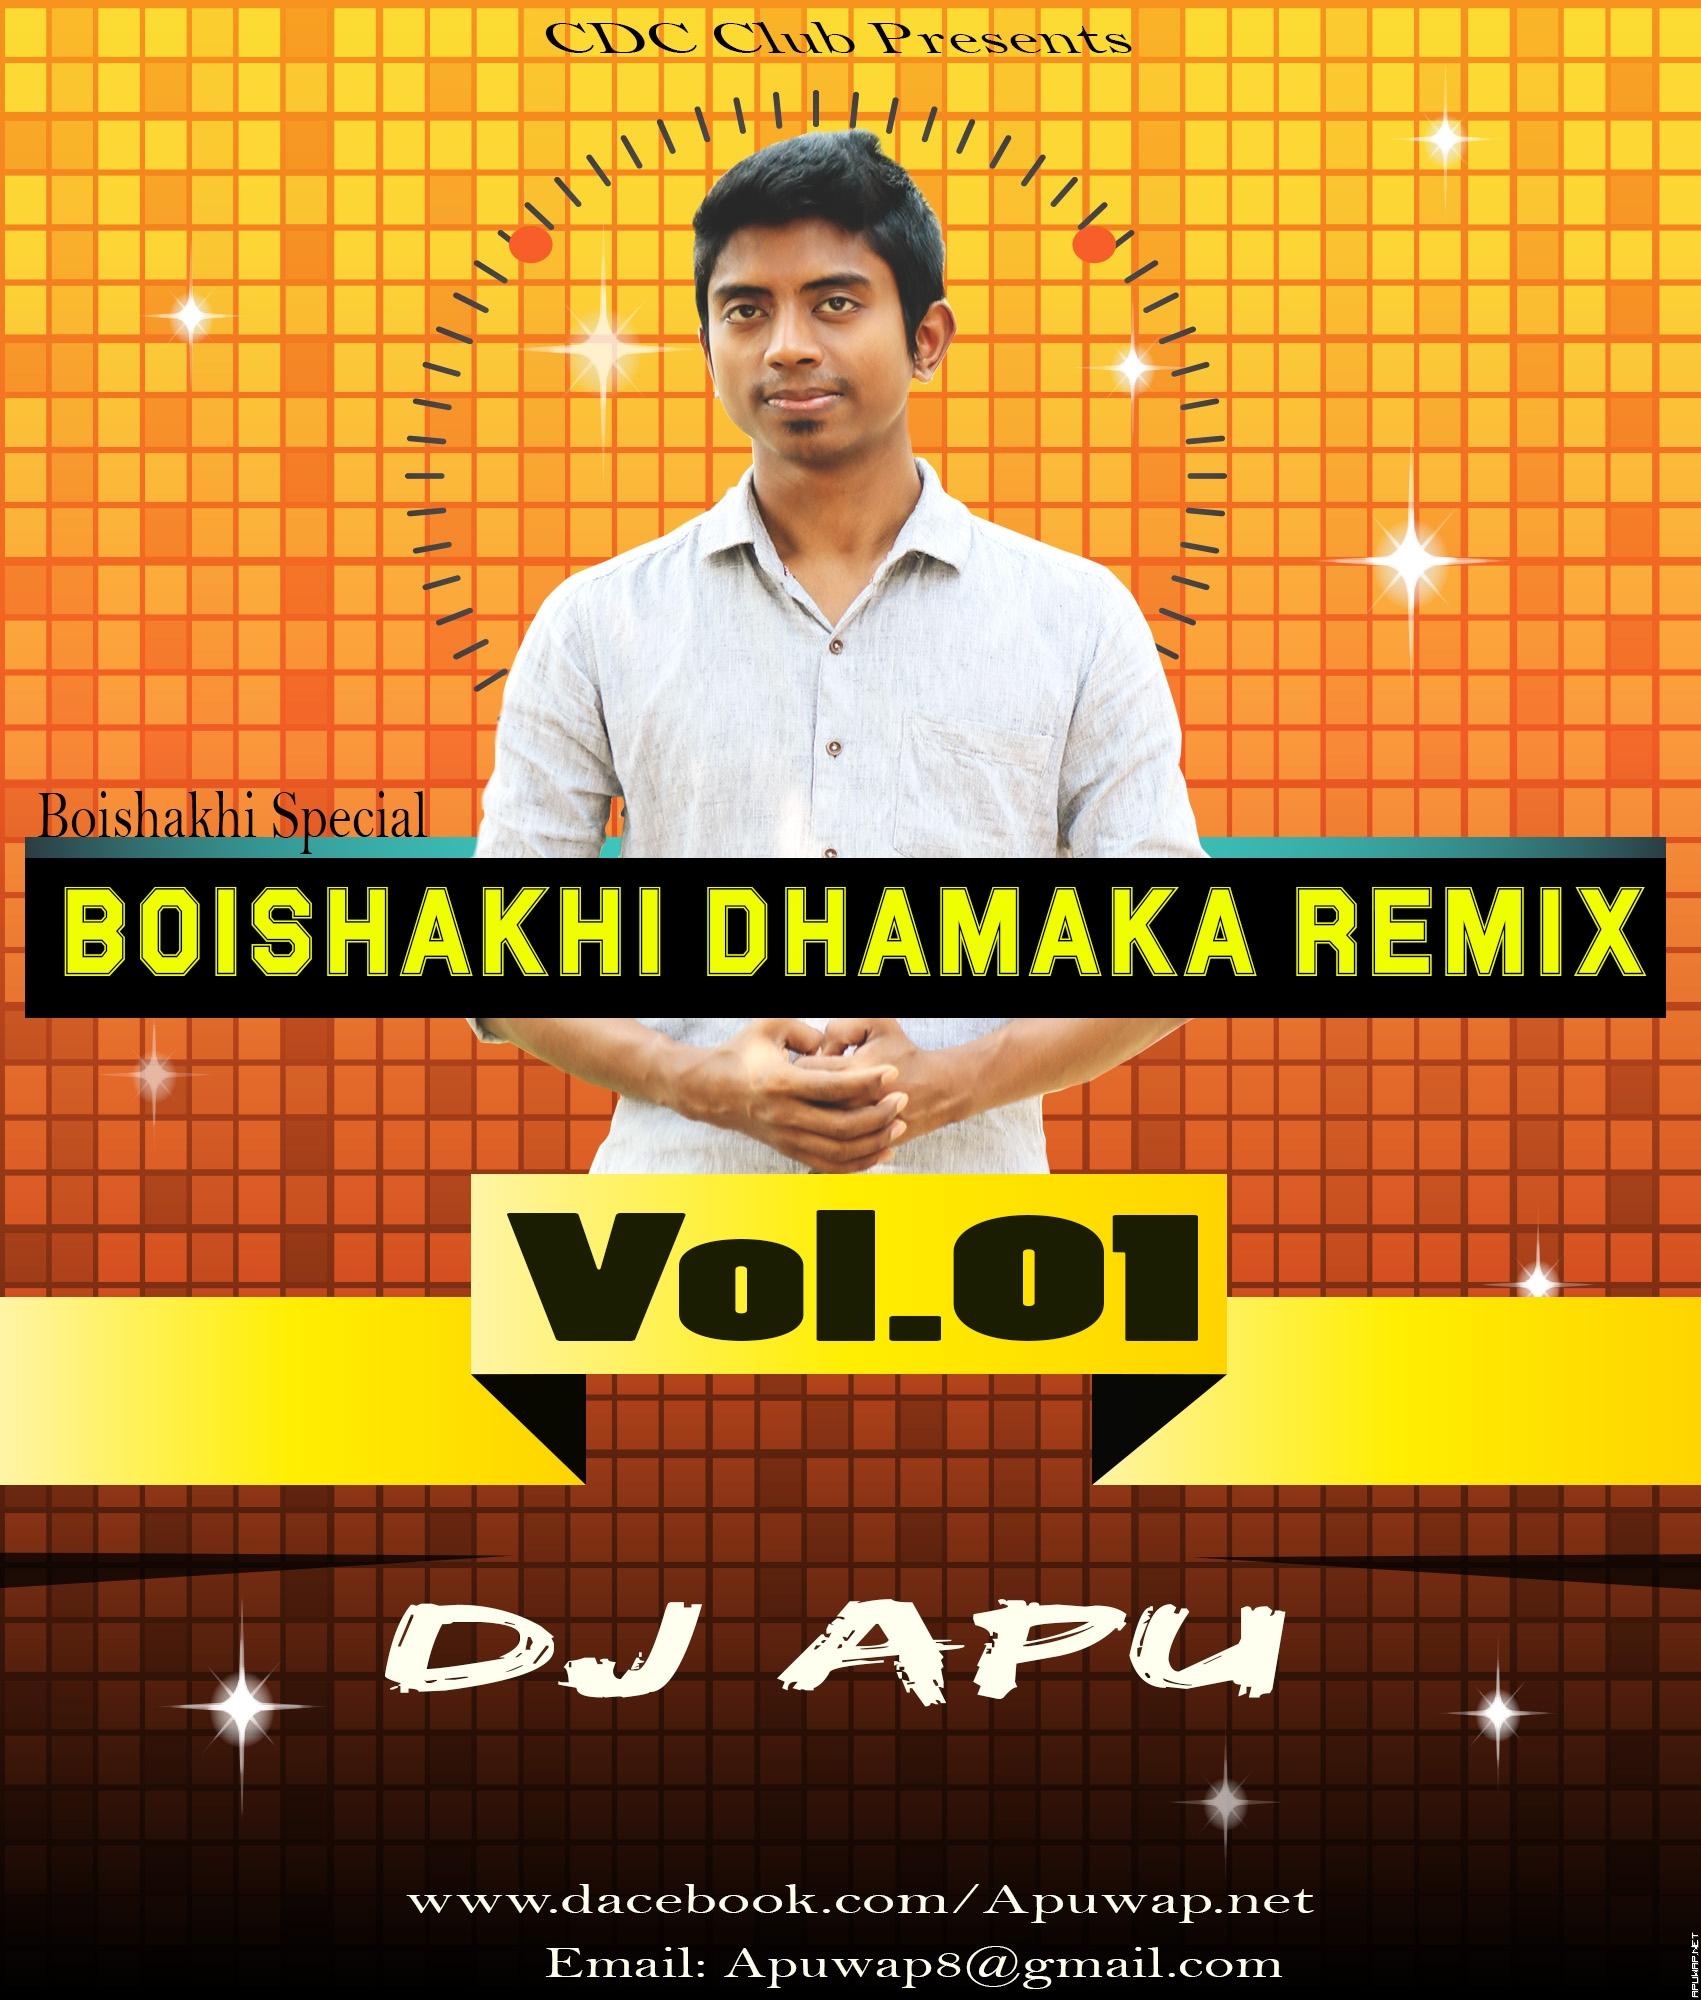 Ailo Ailo Ailore Ronge Vora Boishakh (Tapori Hot Dance) Dj Apu.mp3